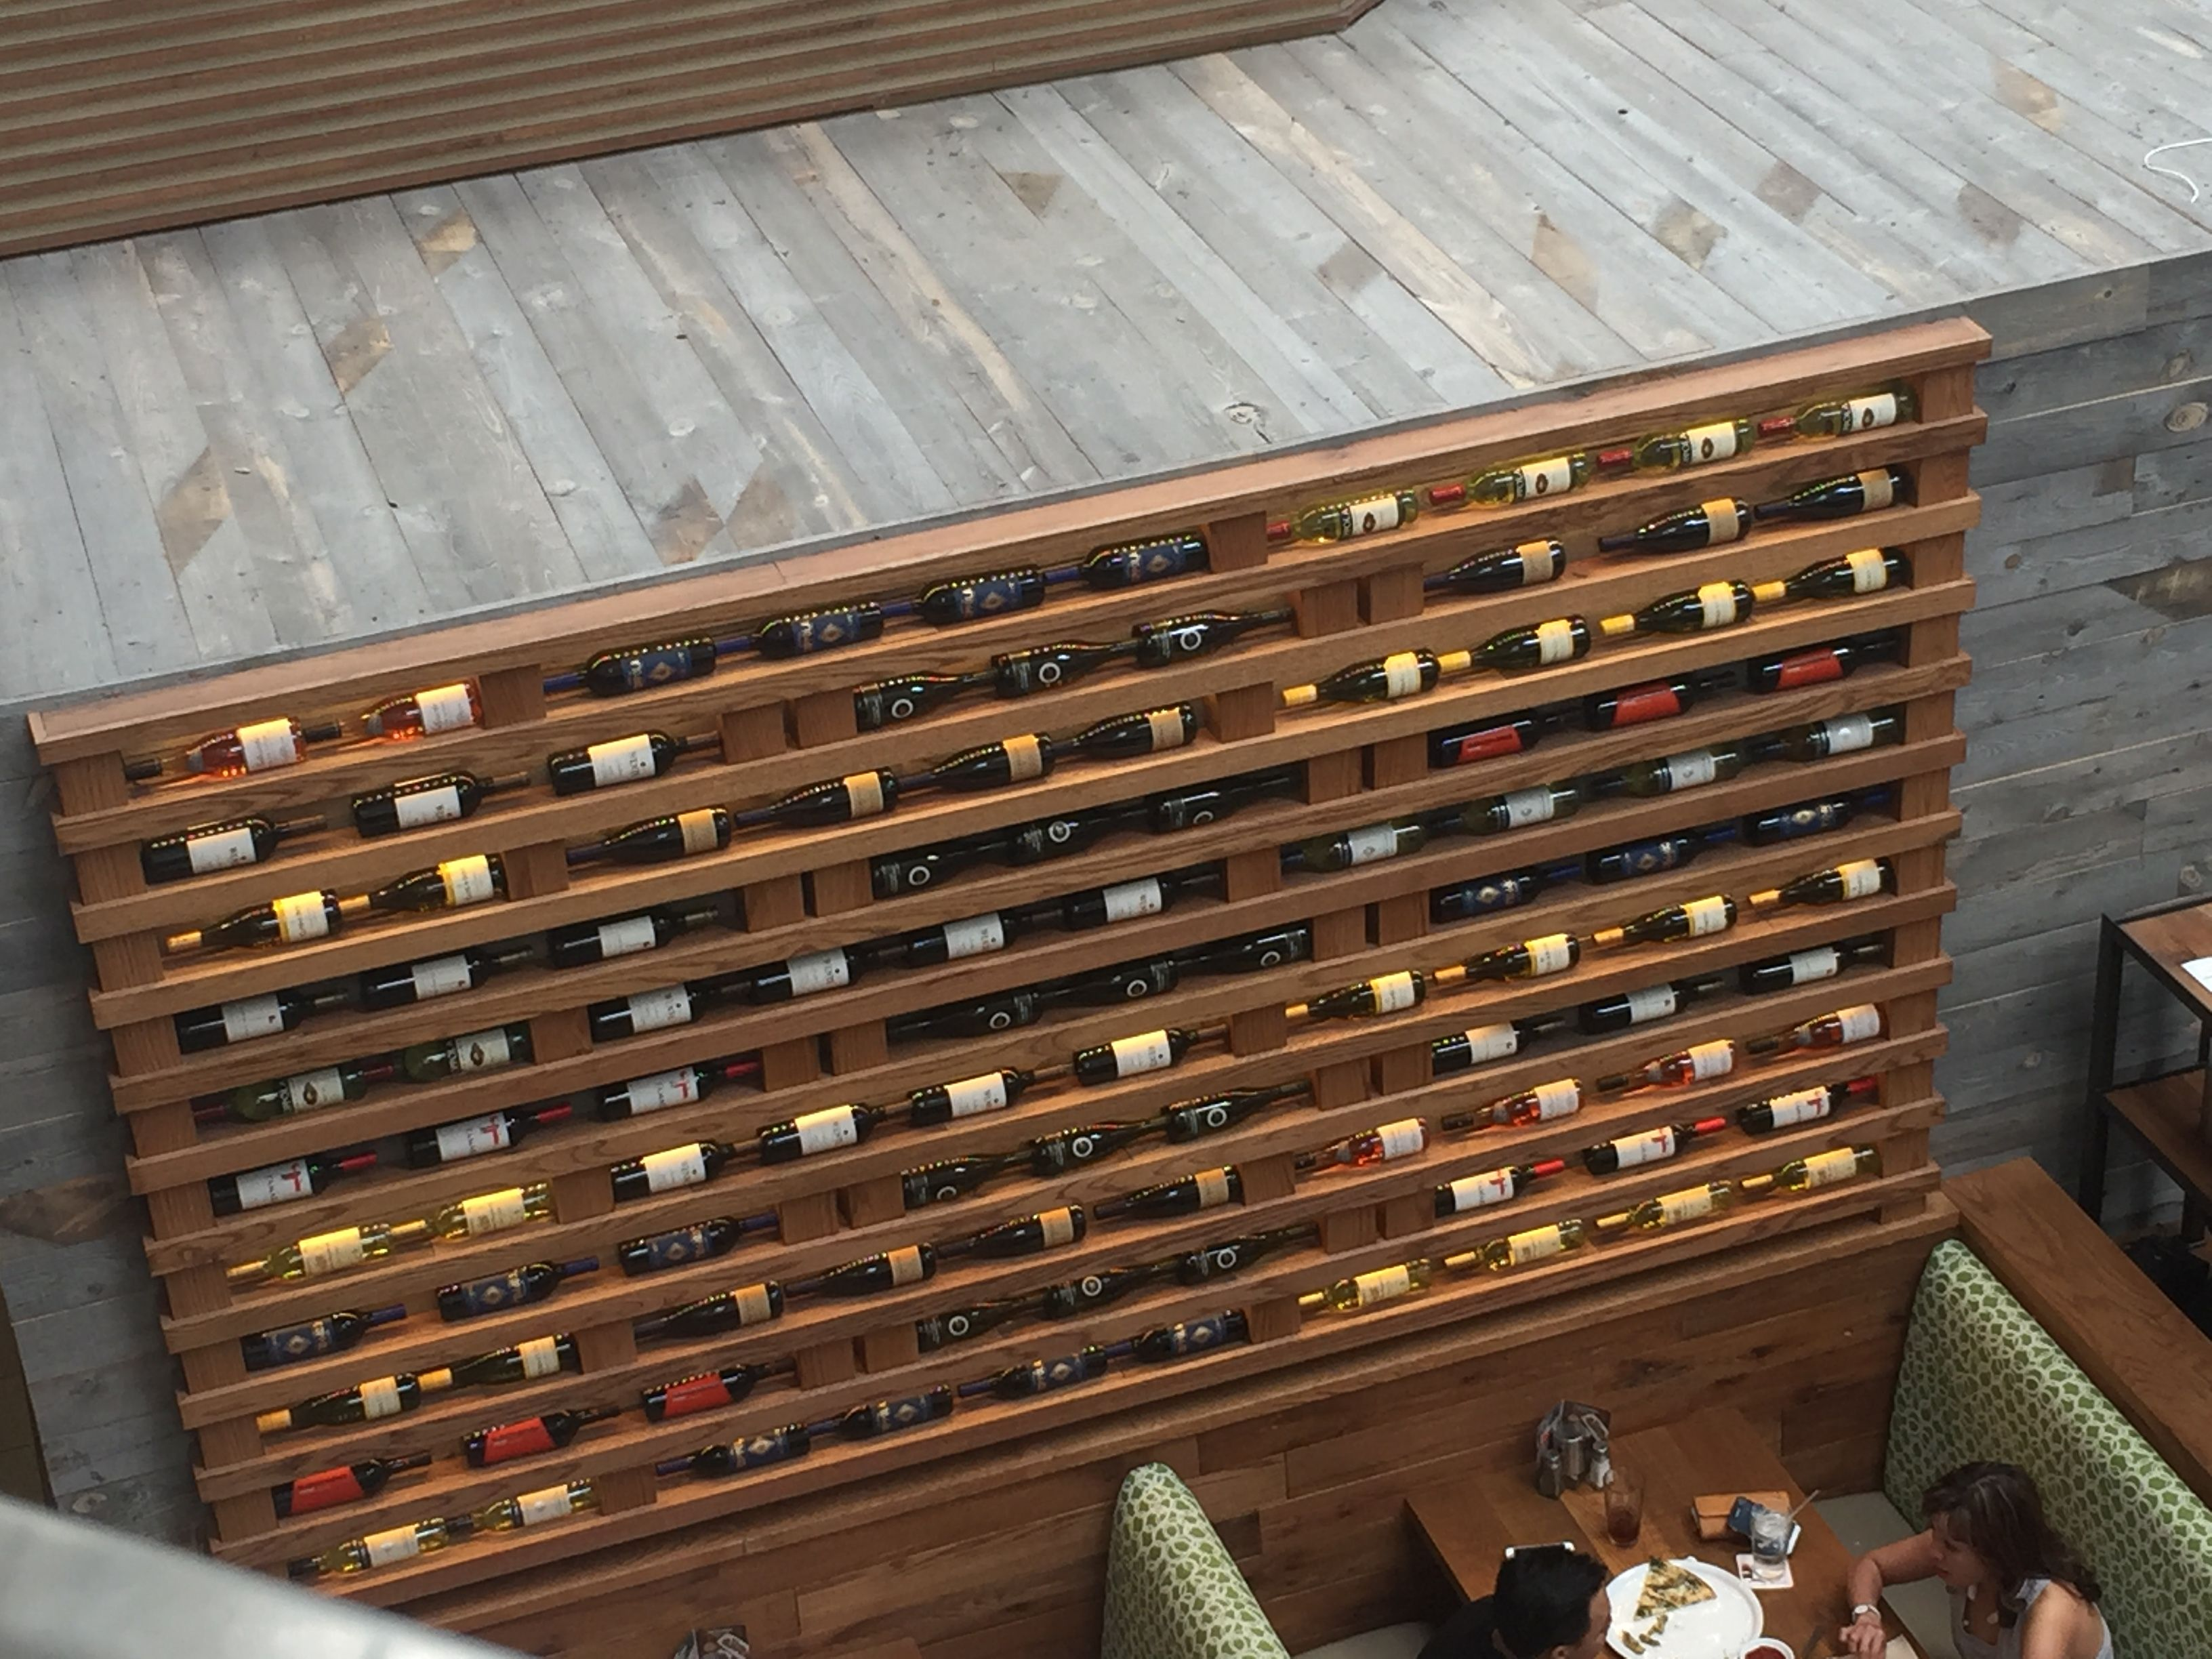 Dimly illuminated wine rack